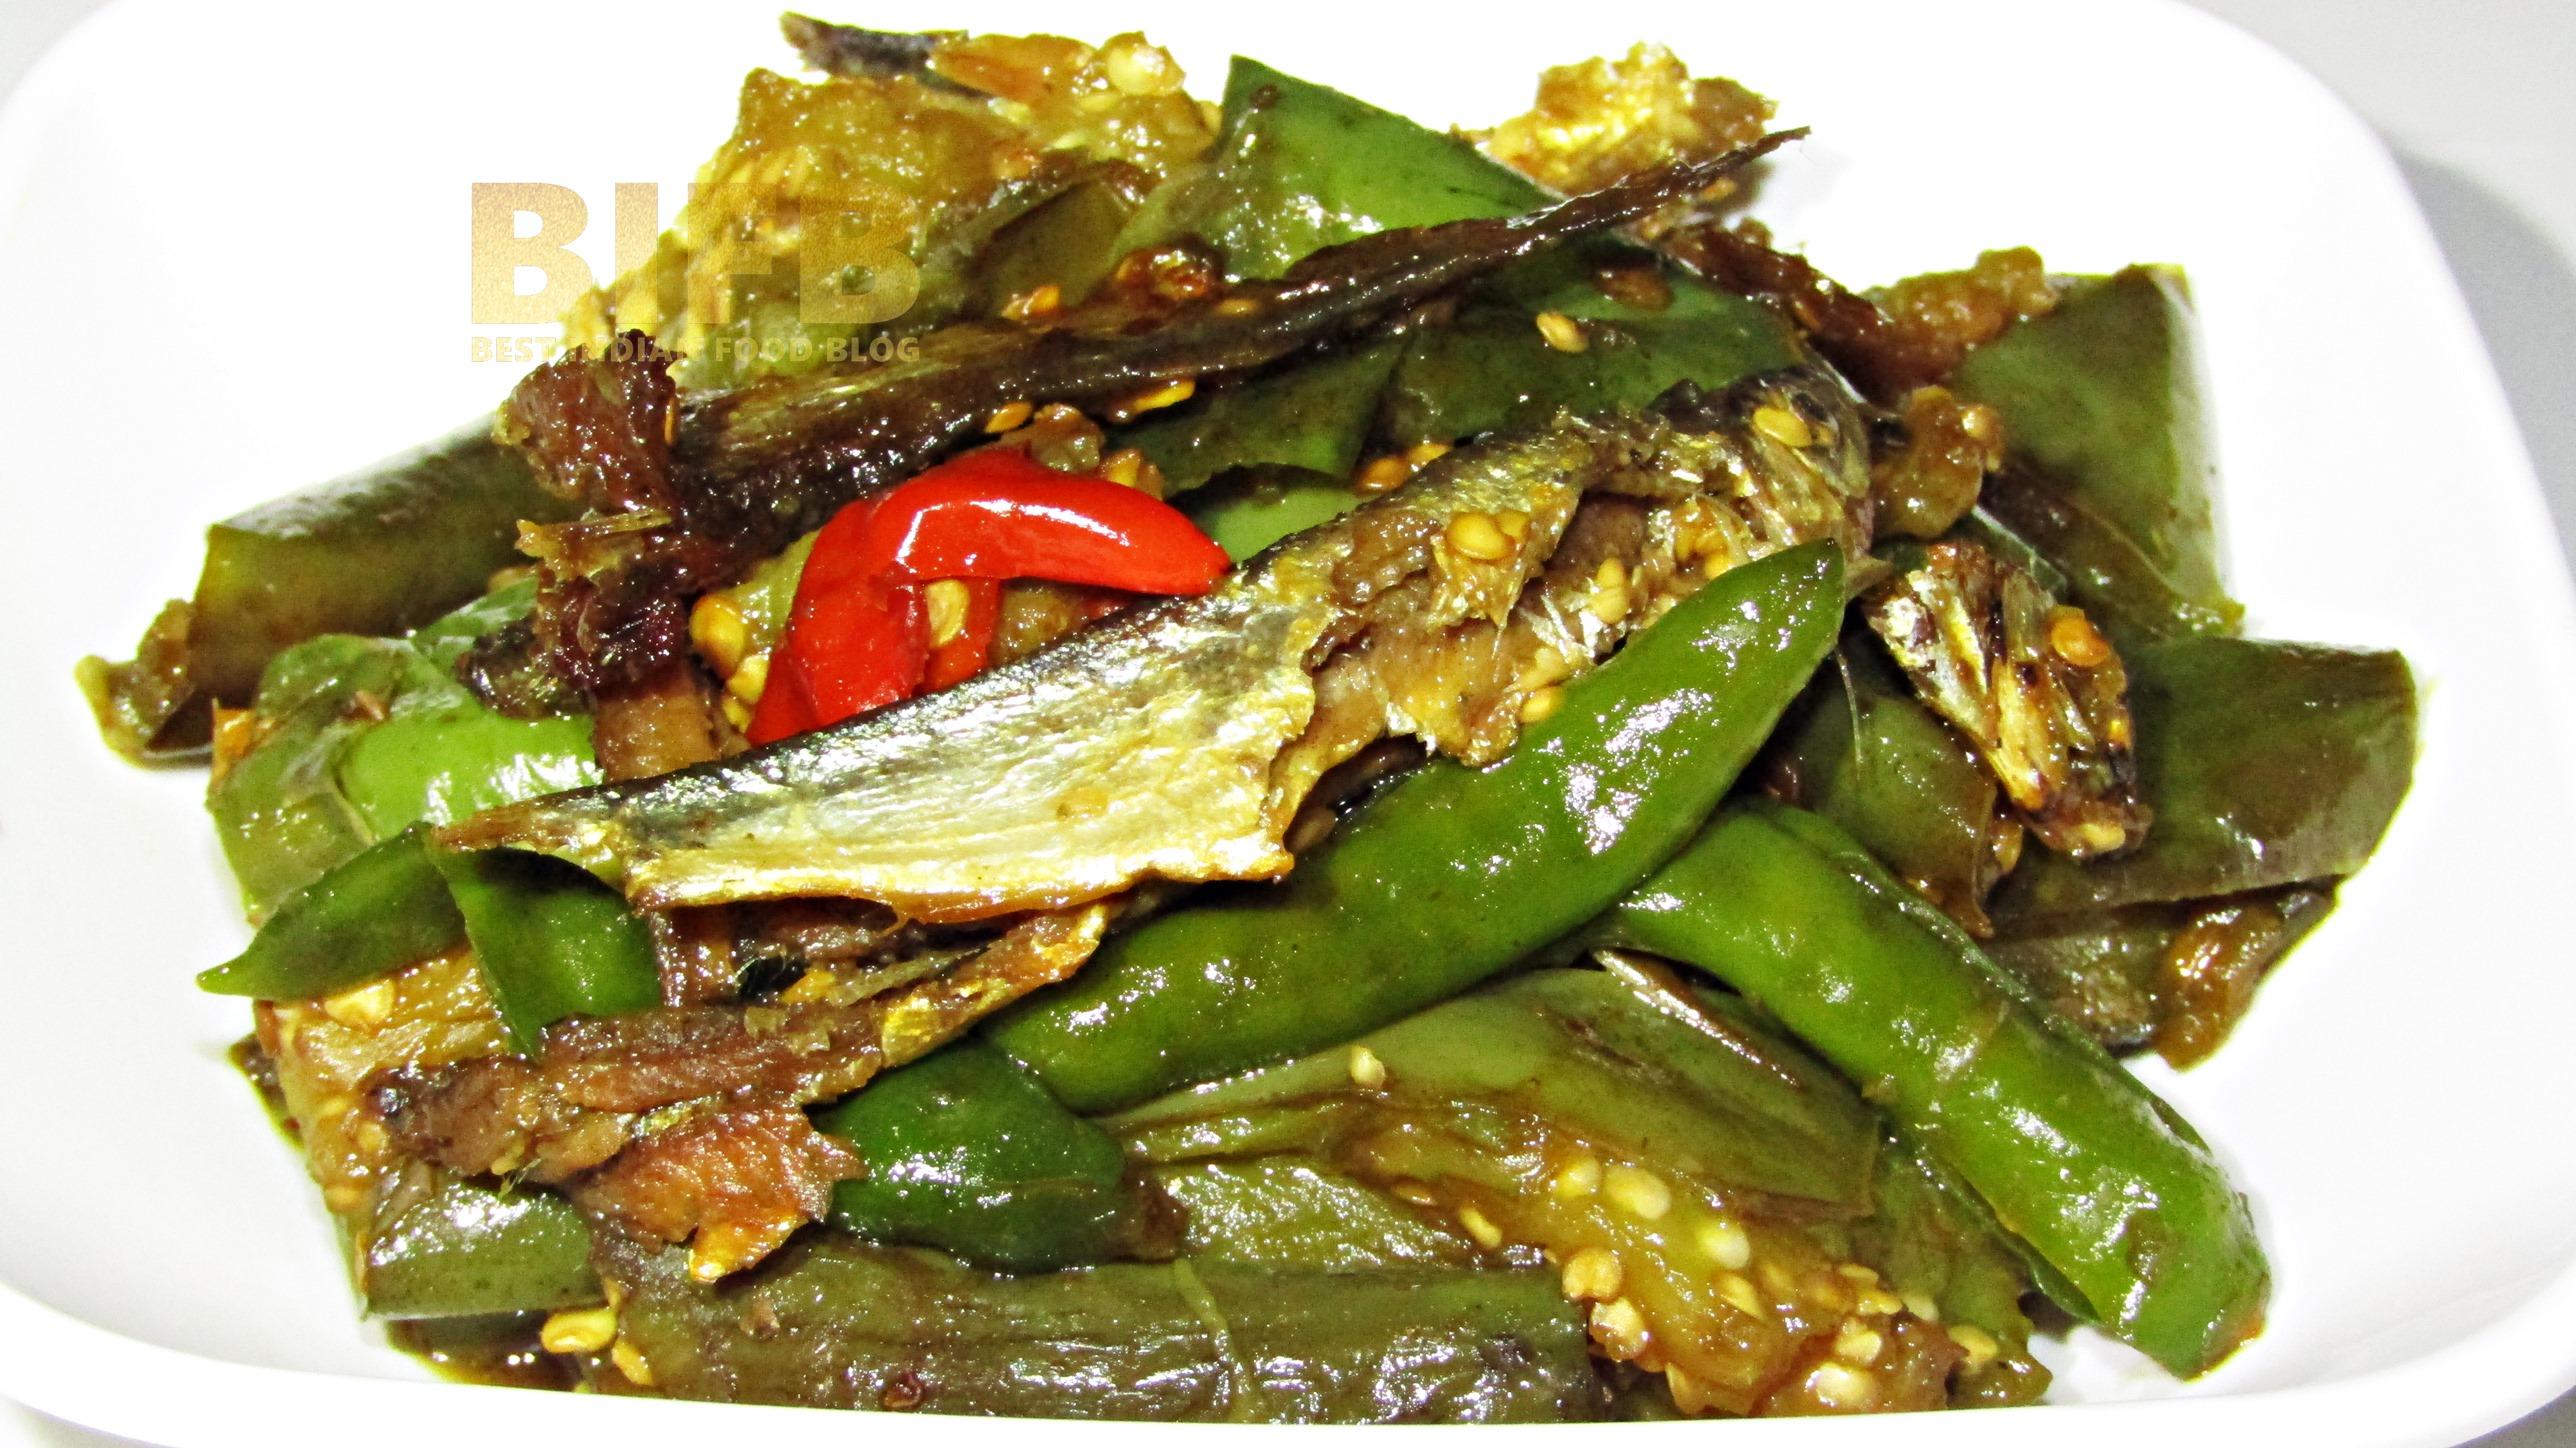 Baring Na'kam from Meghalaya, India | Best Indian Food Blog | Dehydrated Fish Aubergine recipe